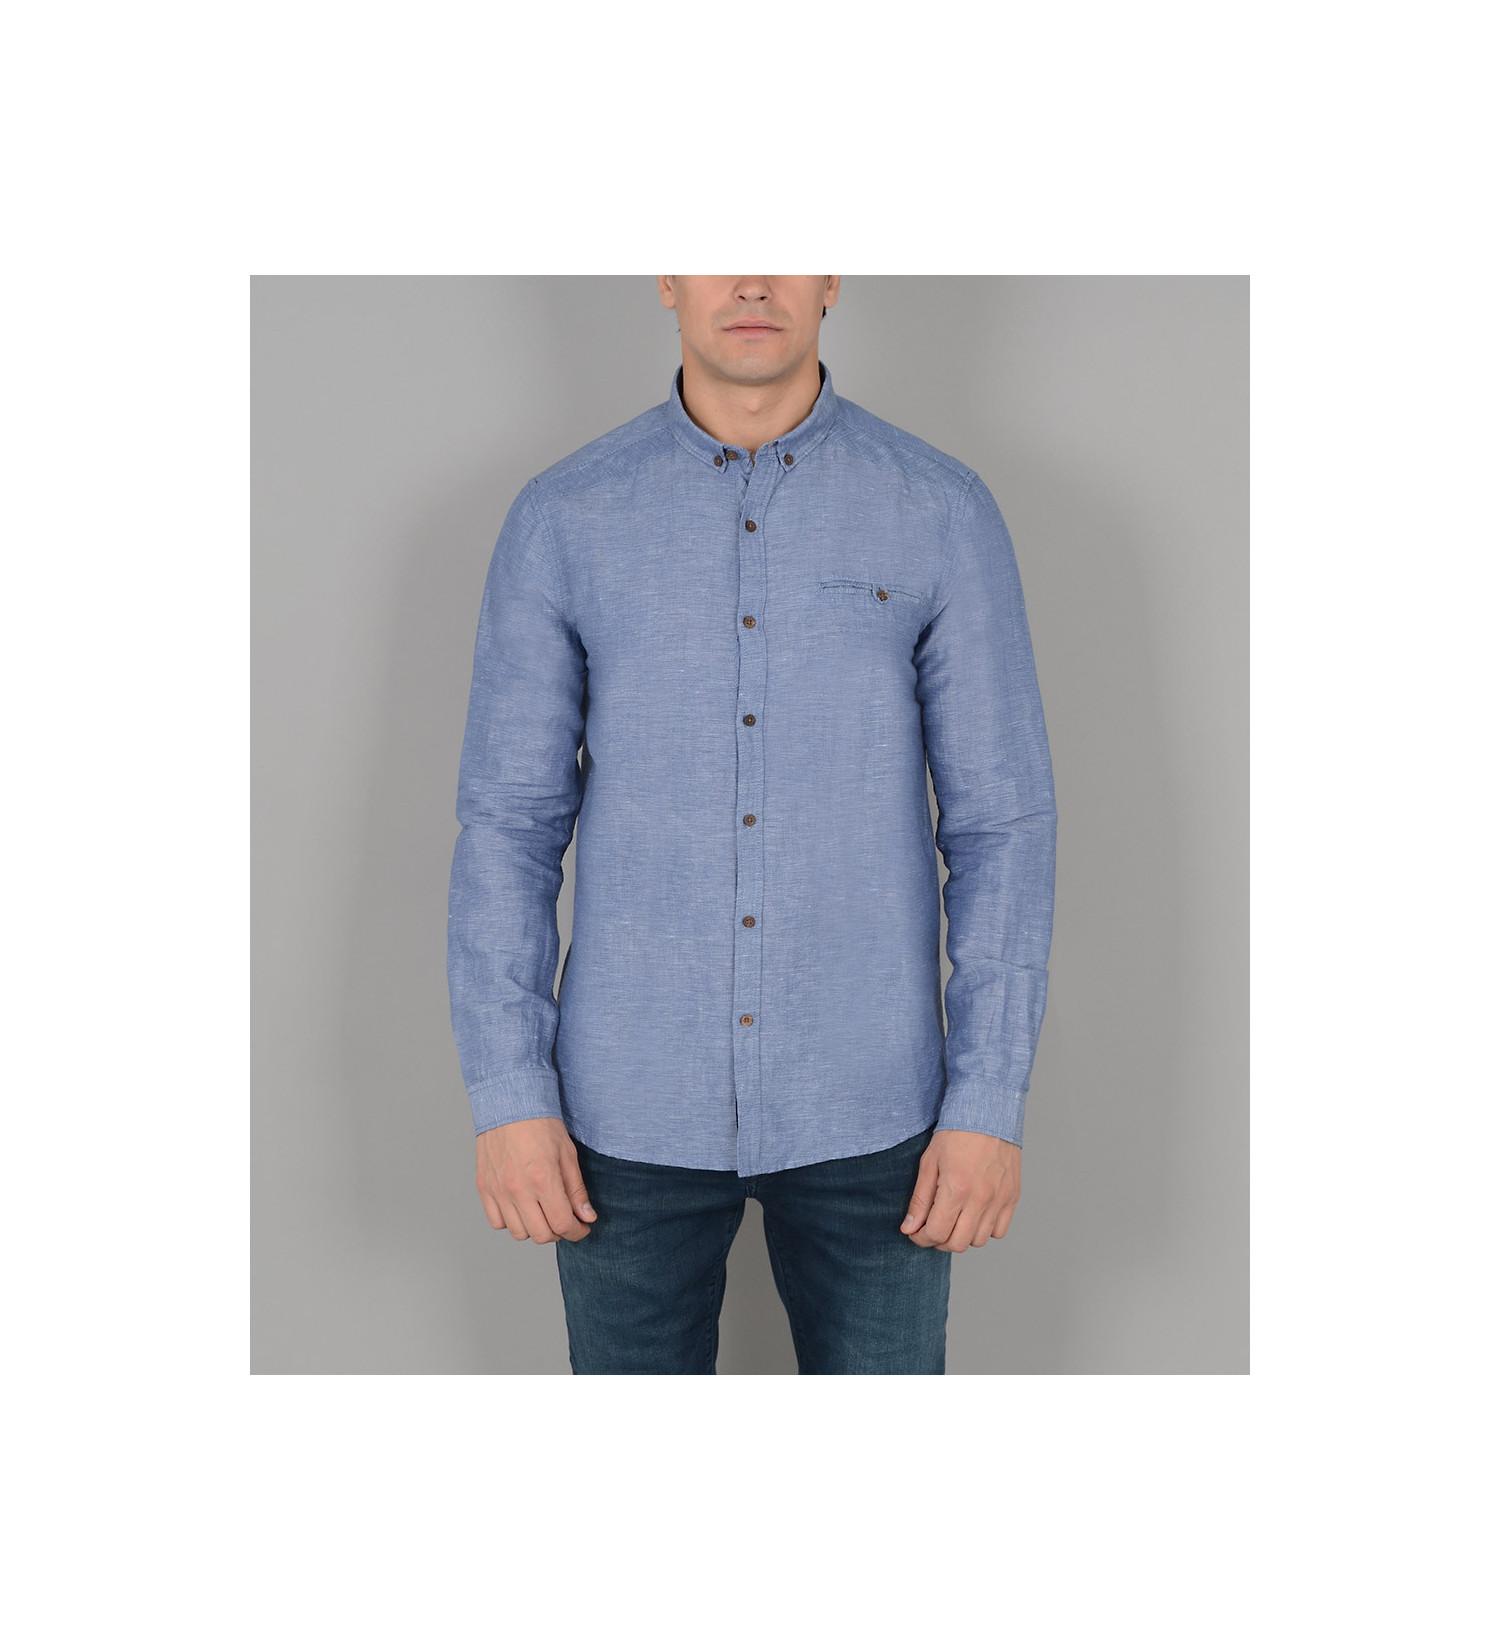 ee00c4391b585 Wrangler - Swim Shorts - Dressup.ge